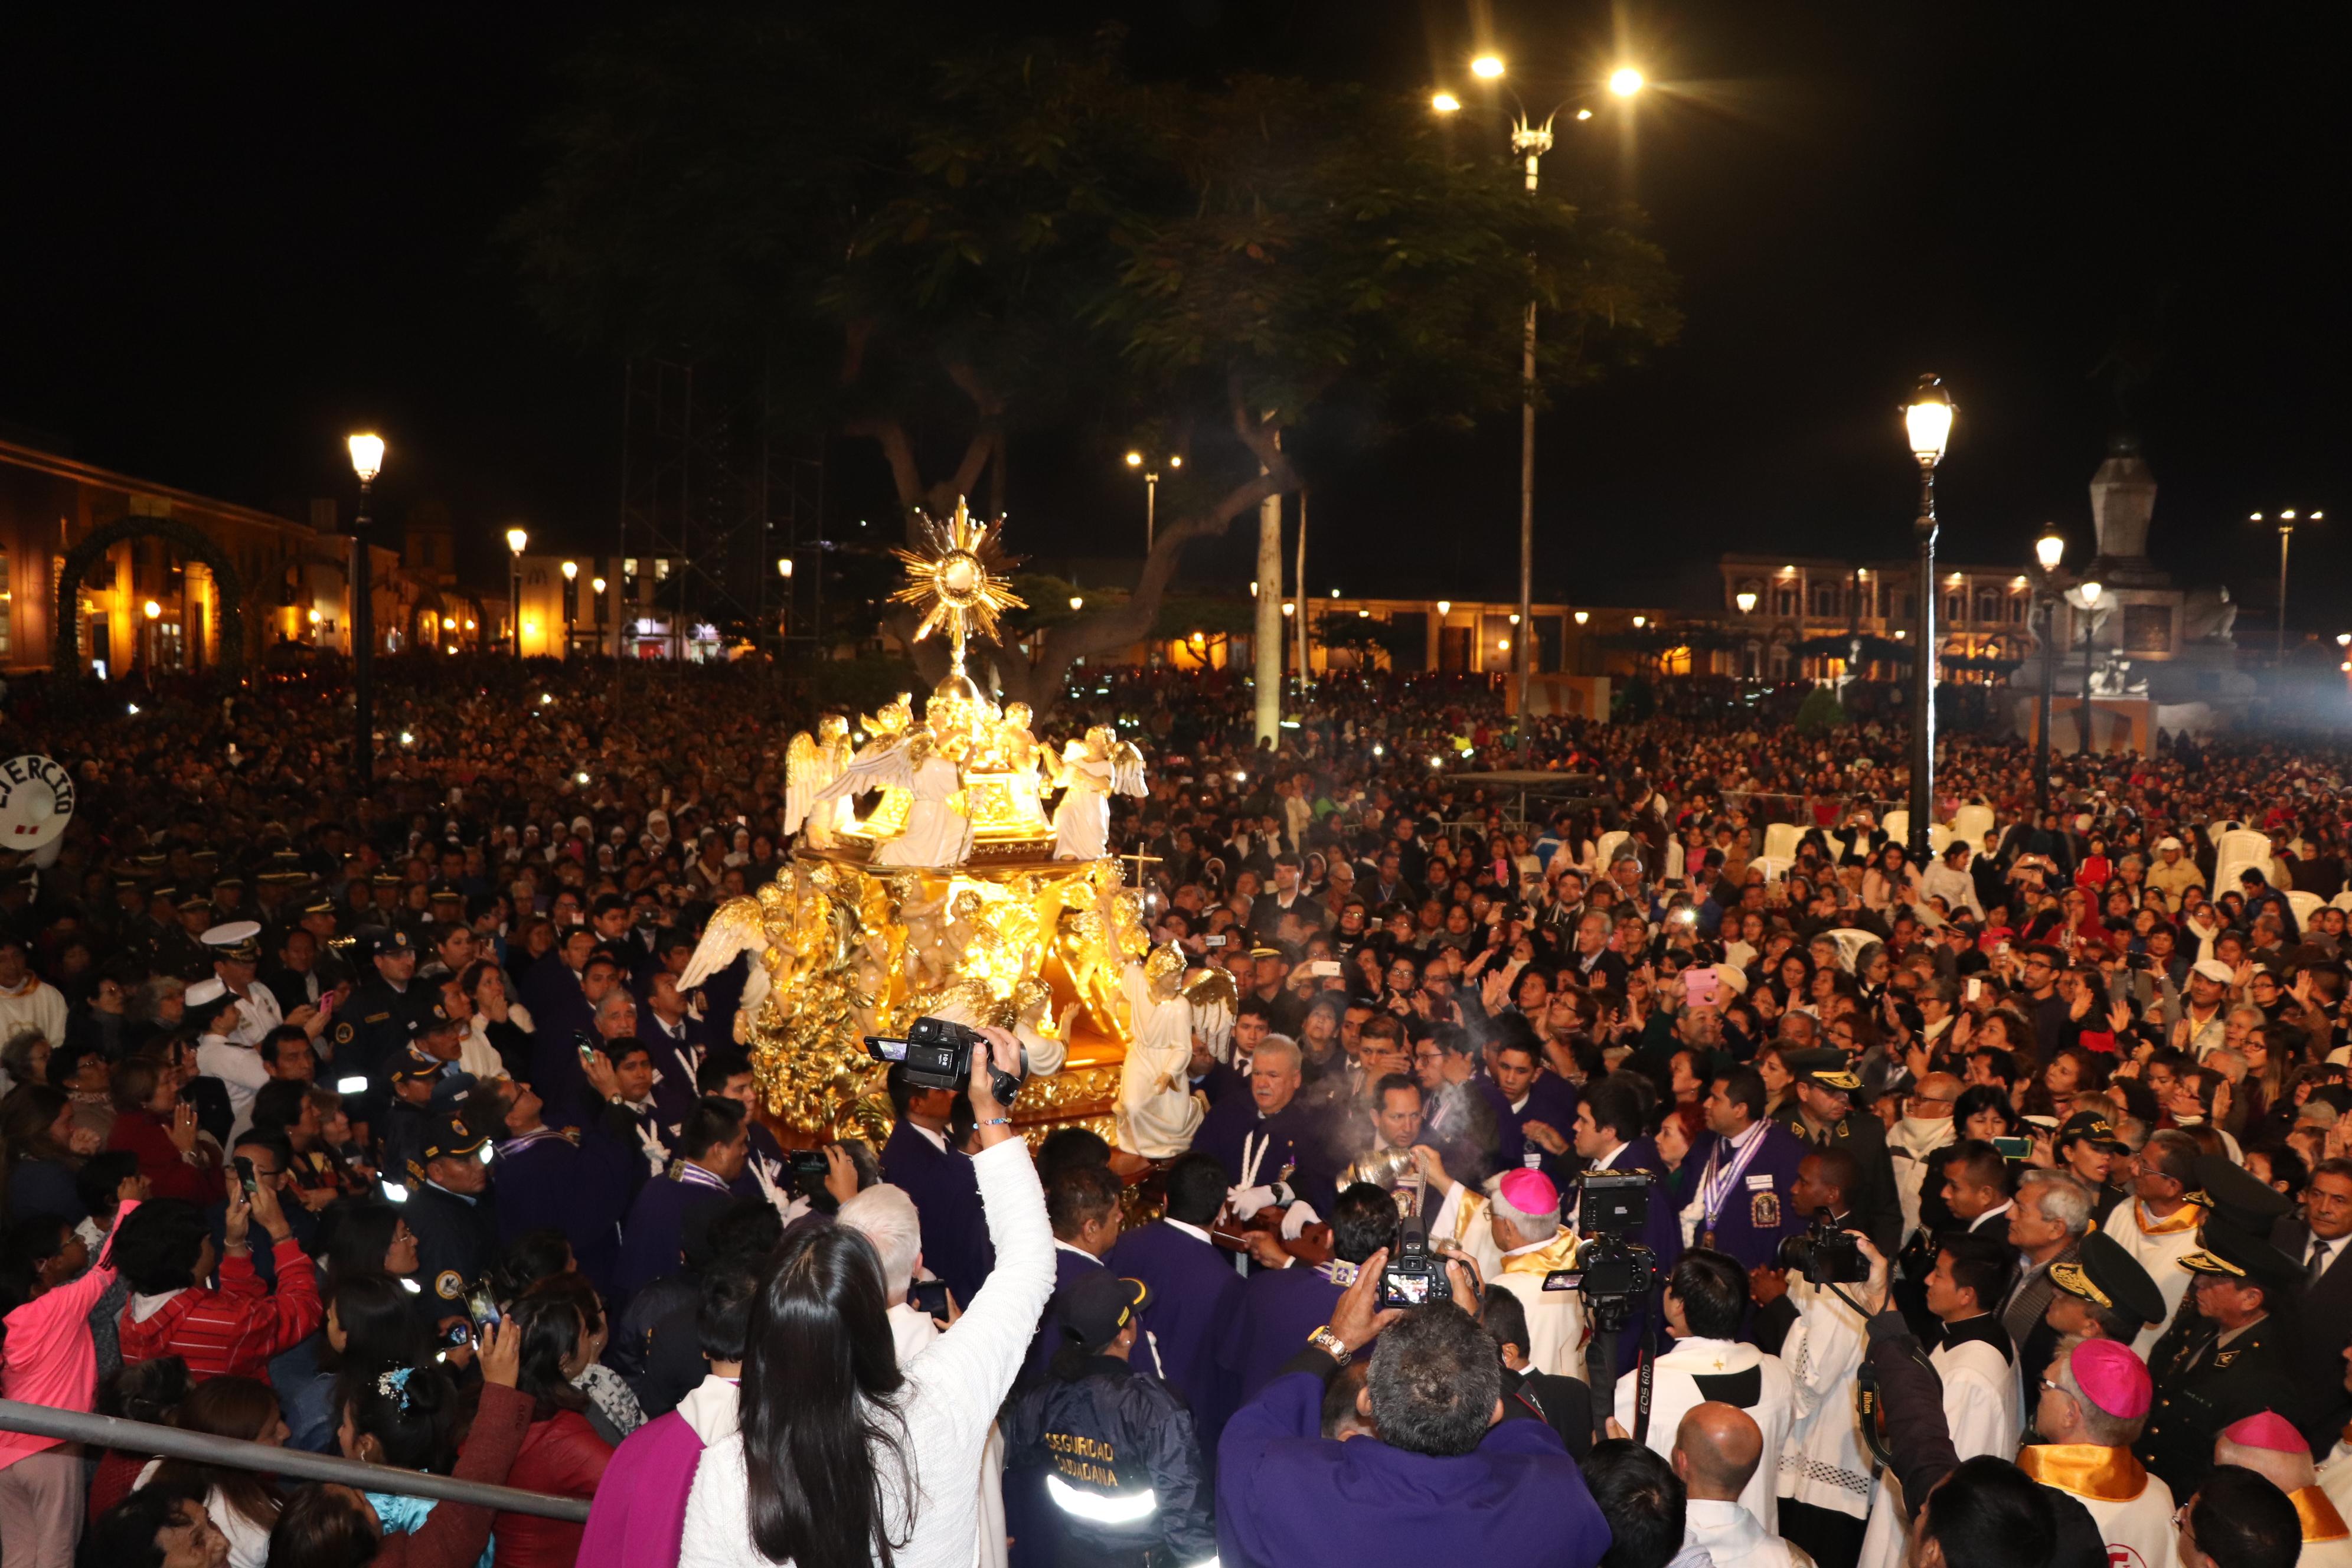 Trujillo: Corpus Christi Arquidiocesano congregó a miles de fieles en la Plaza de Armas